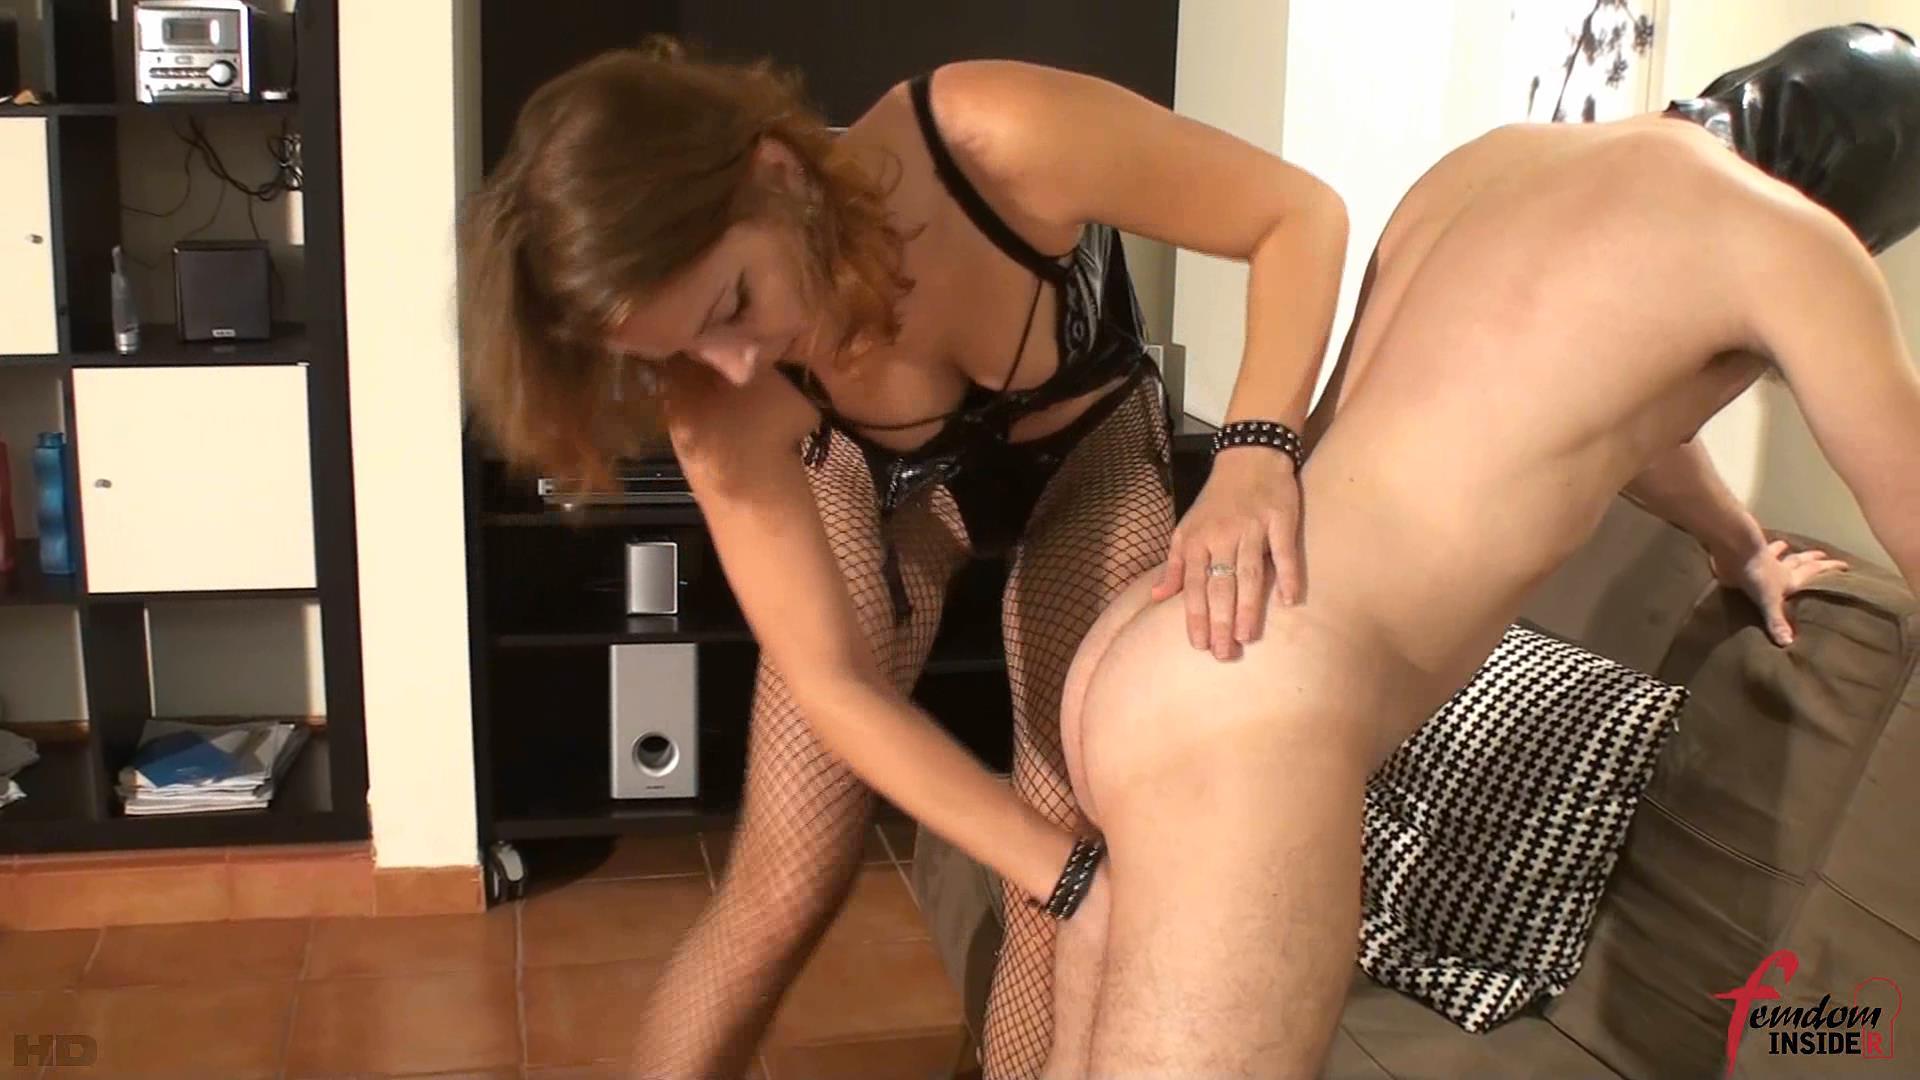 Mistress Nataly In Scene: The Ball Squeezer - FEMDOMINSIDER - FULL HD/1080p/WMV